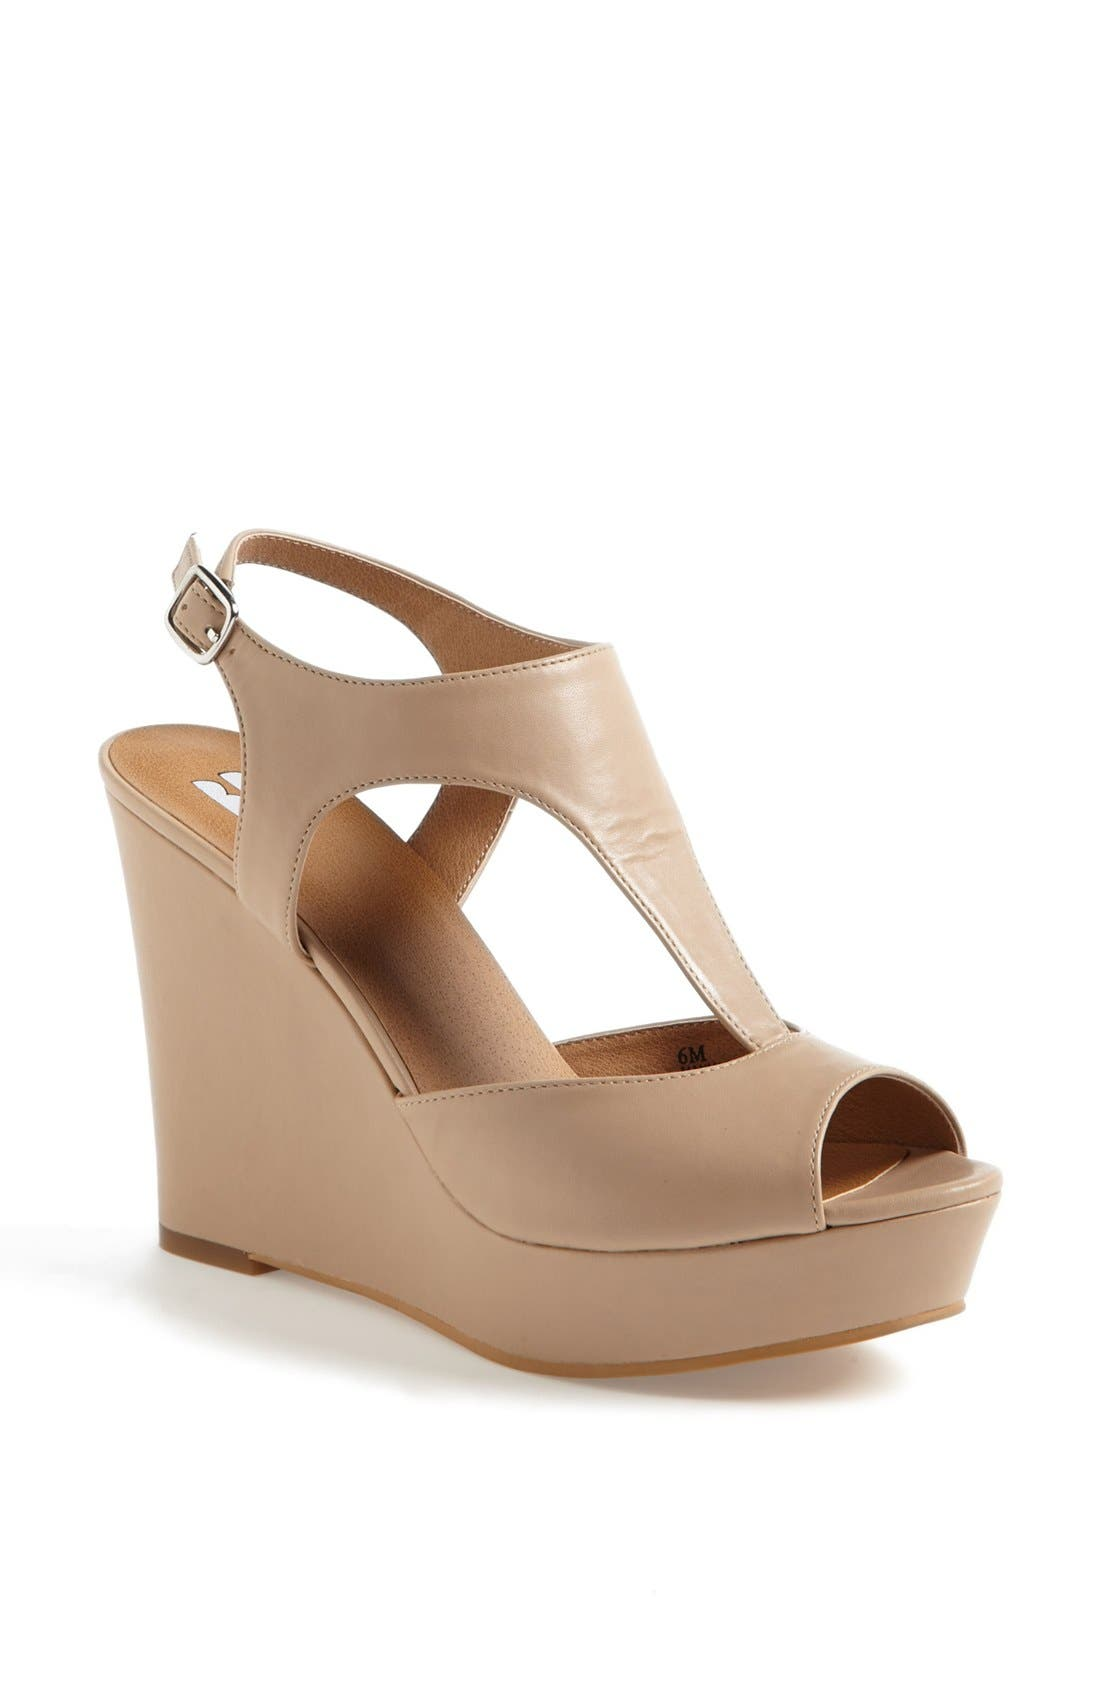 Main Image - BP. 'Springs' Wedge Sandal (Women)